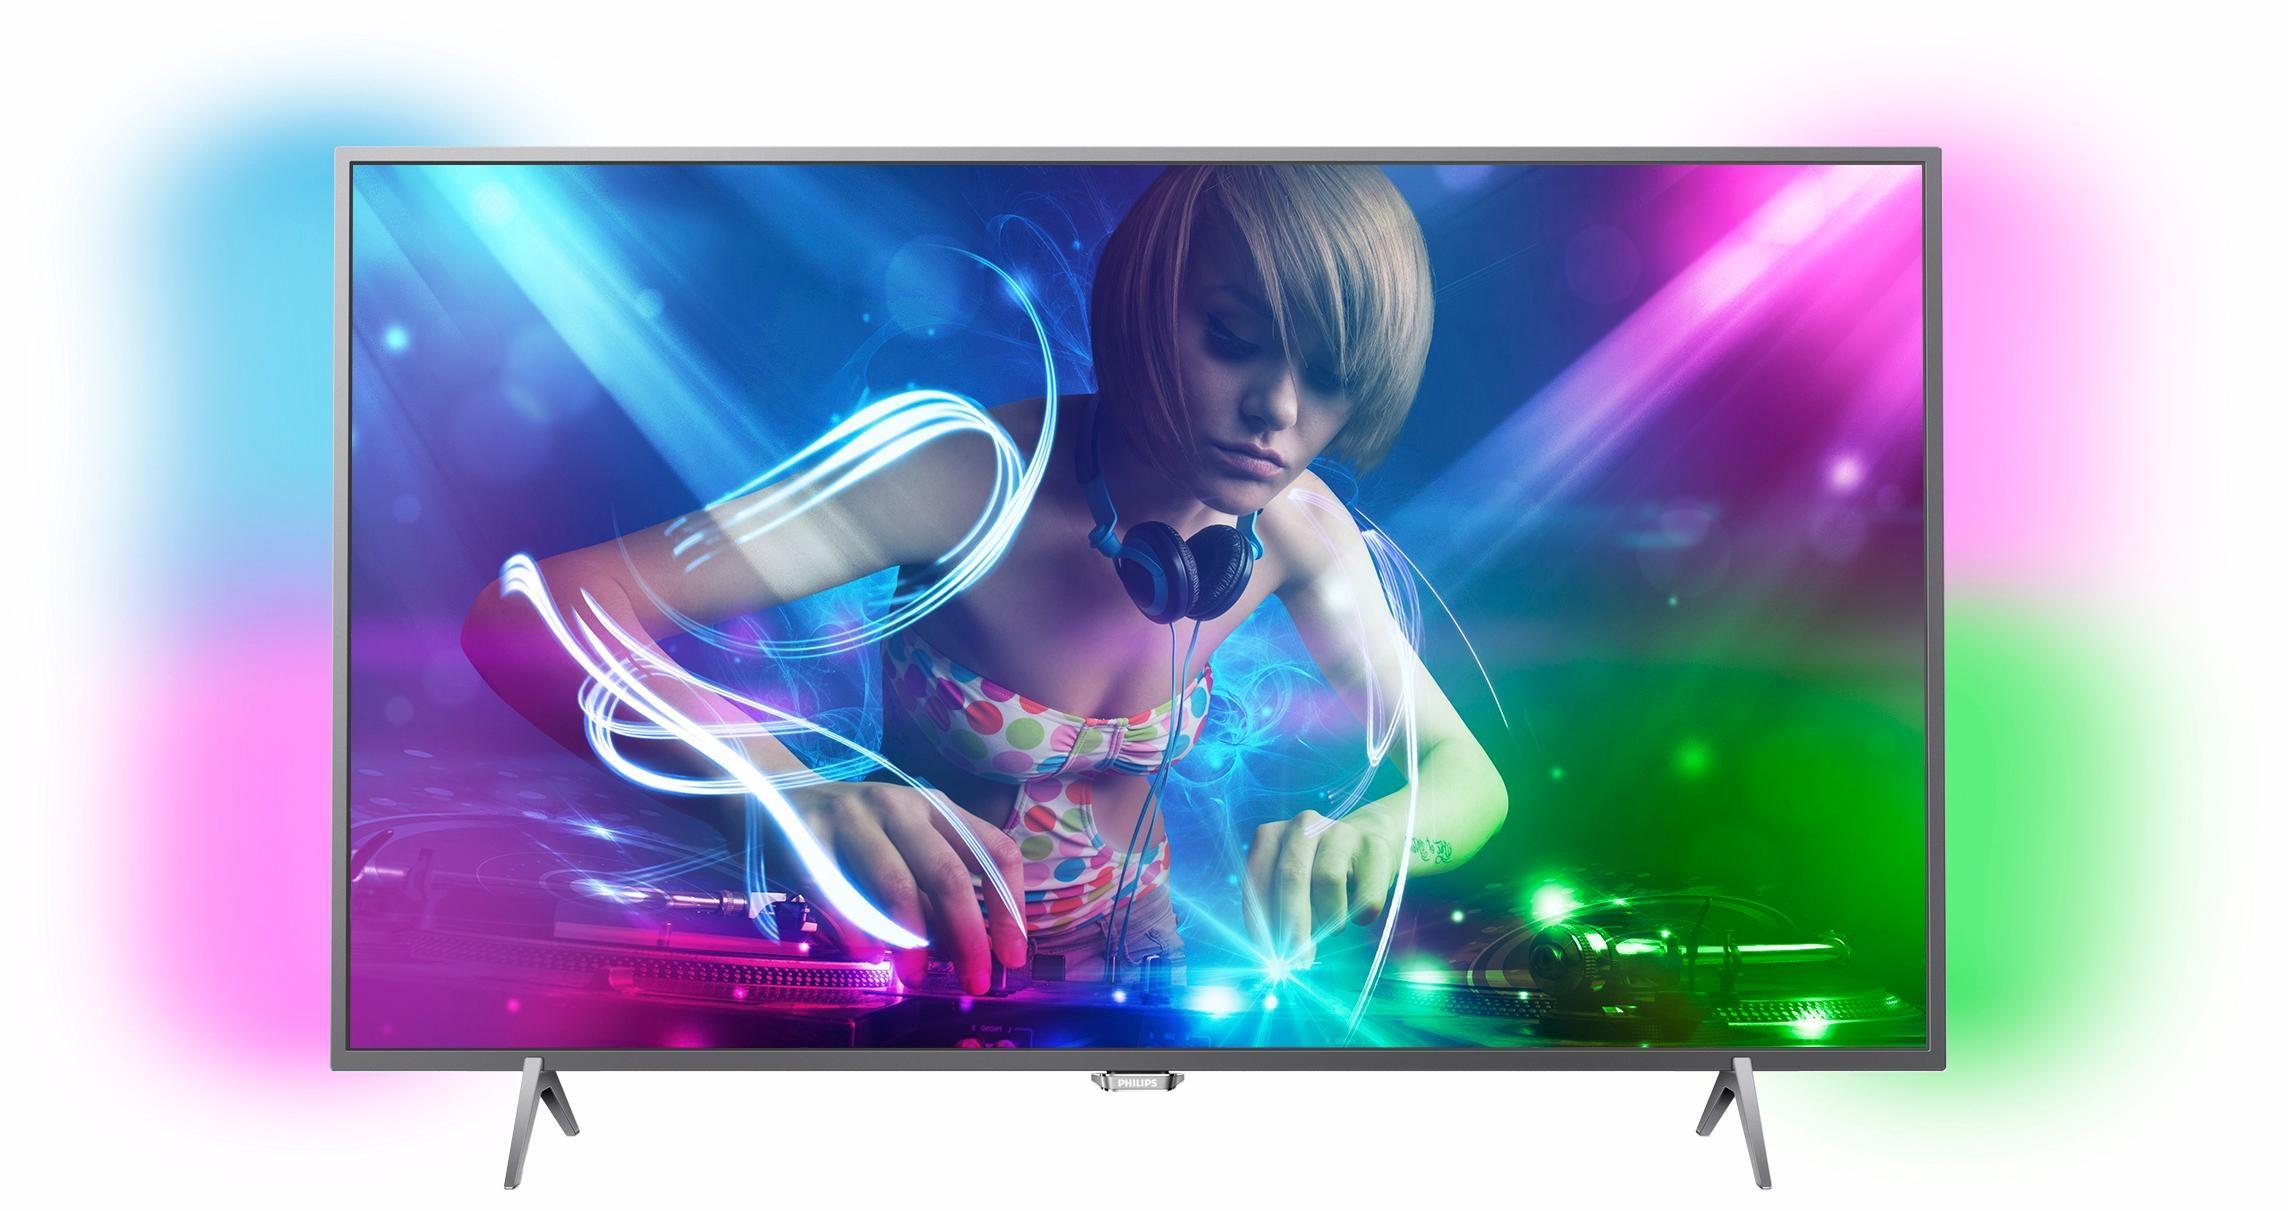 Philips 49PUS6401/12 LED TV (123 cm (49 Zoll), Ultra HD, Ambilight) inkl. 36 Monate Garantie